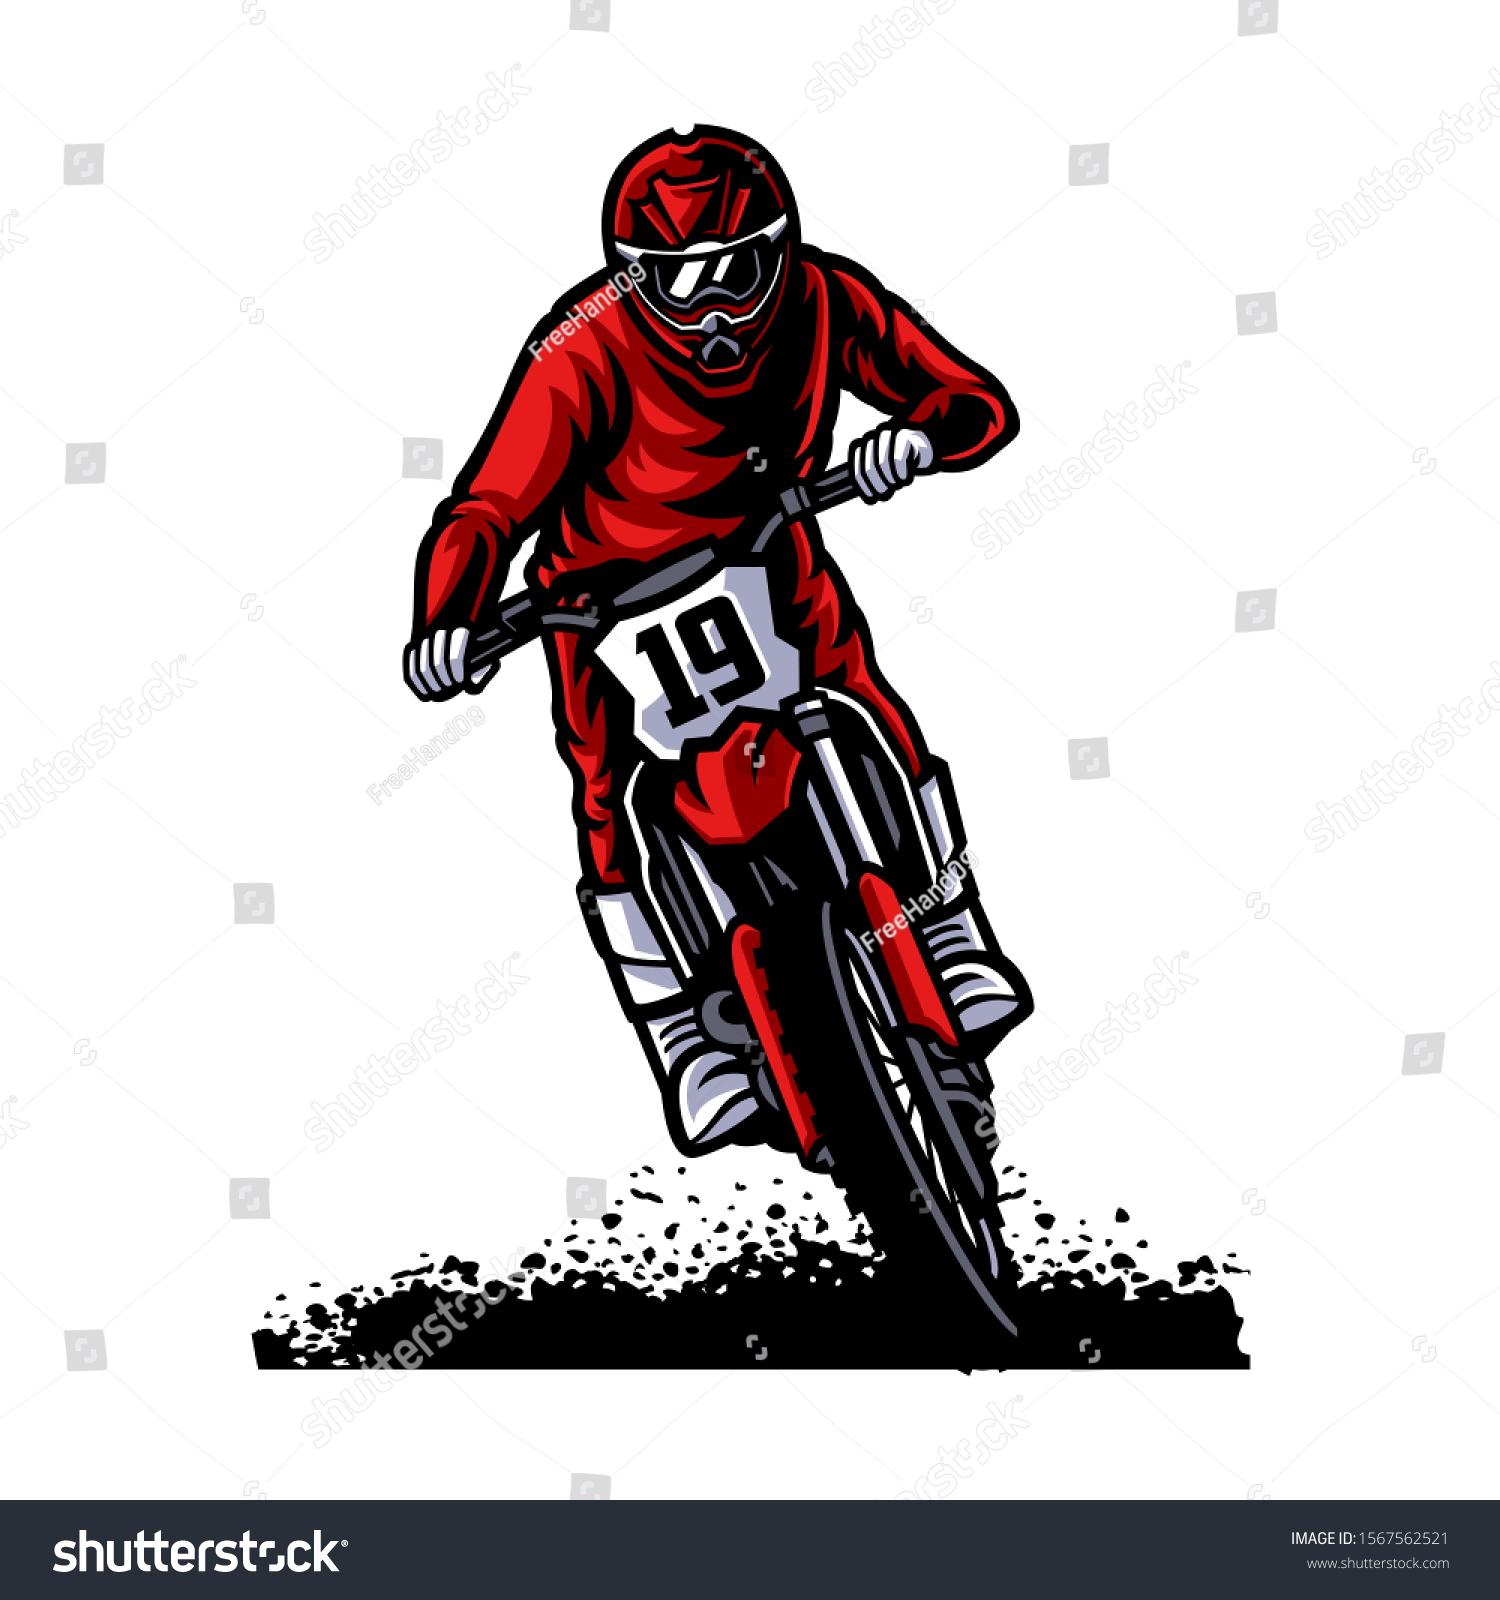 Motocross Vector Logo Illustration Motocross Freestyle Stock Vector Royalty Free 1567562521